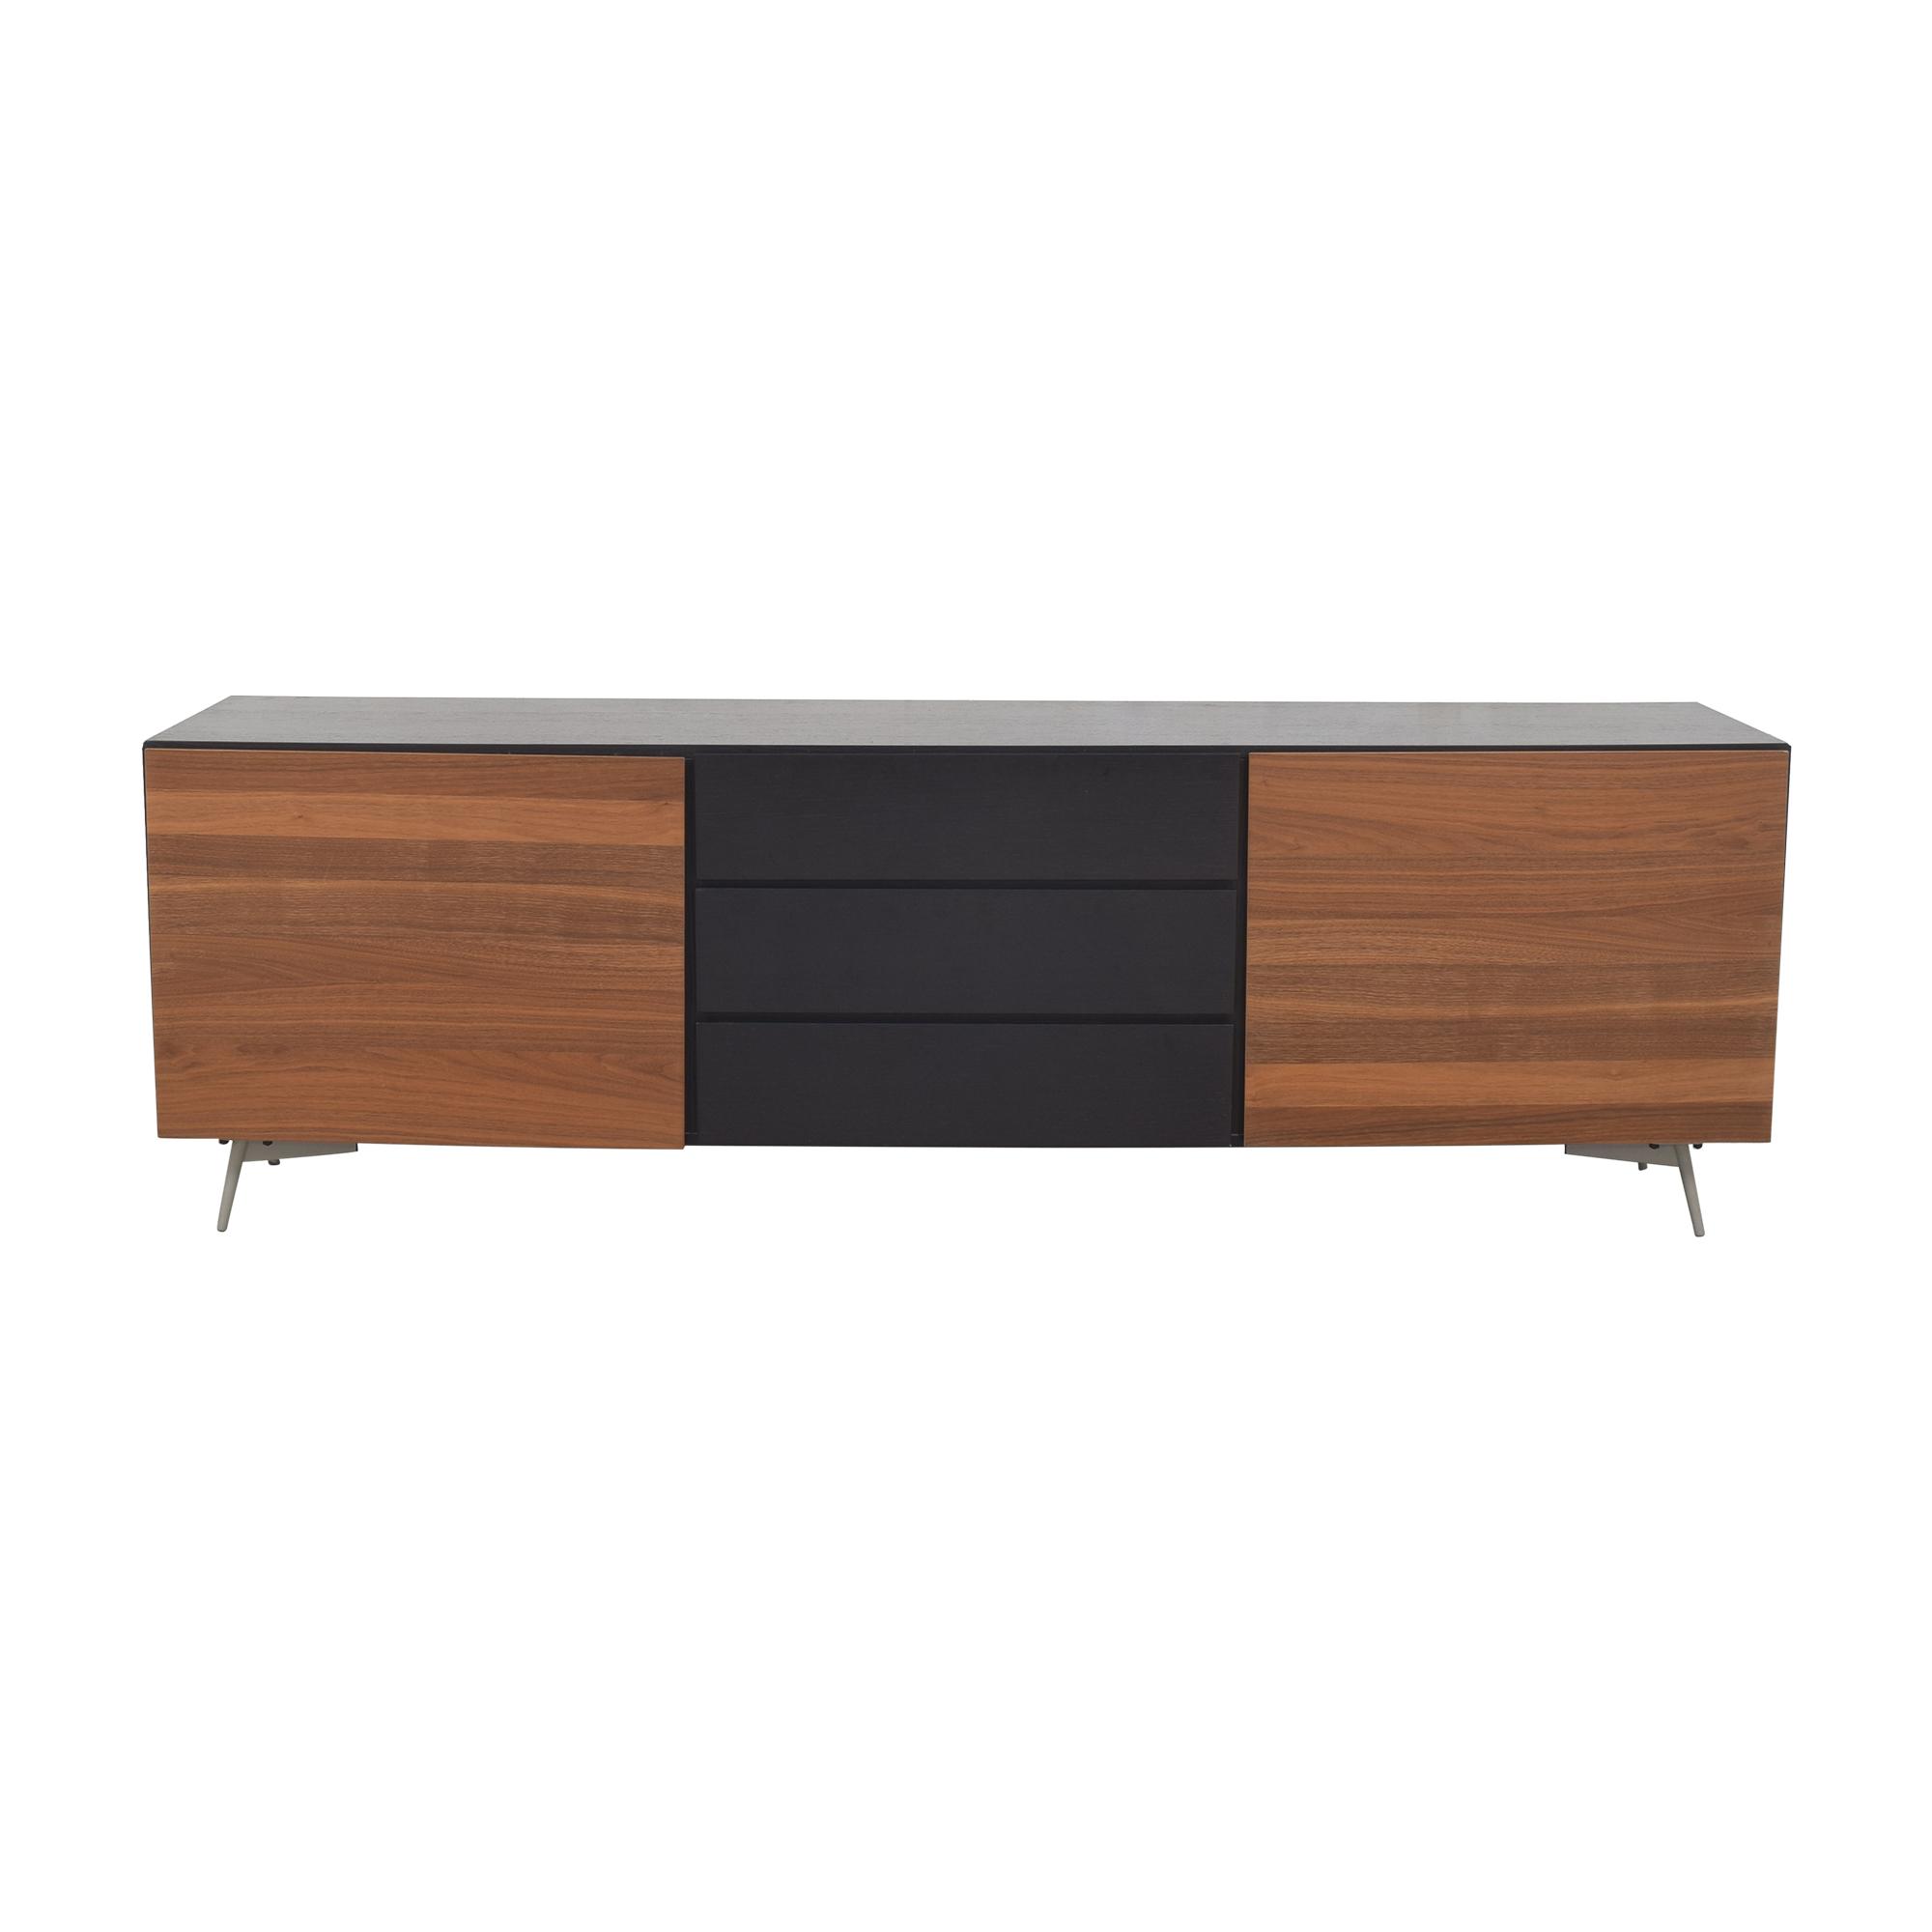 BoConcept Lugano Sideboard / Cabinets & Sideboards